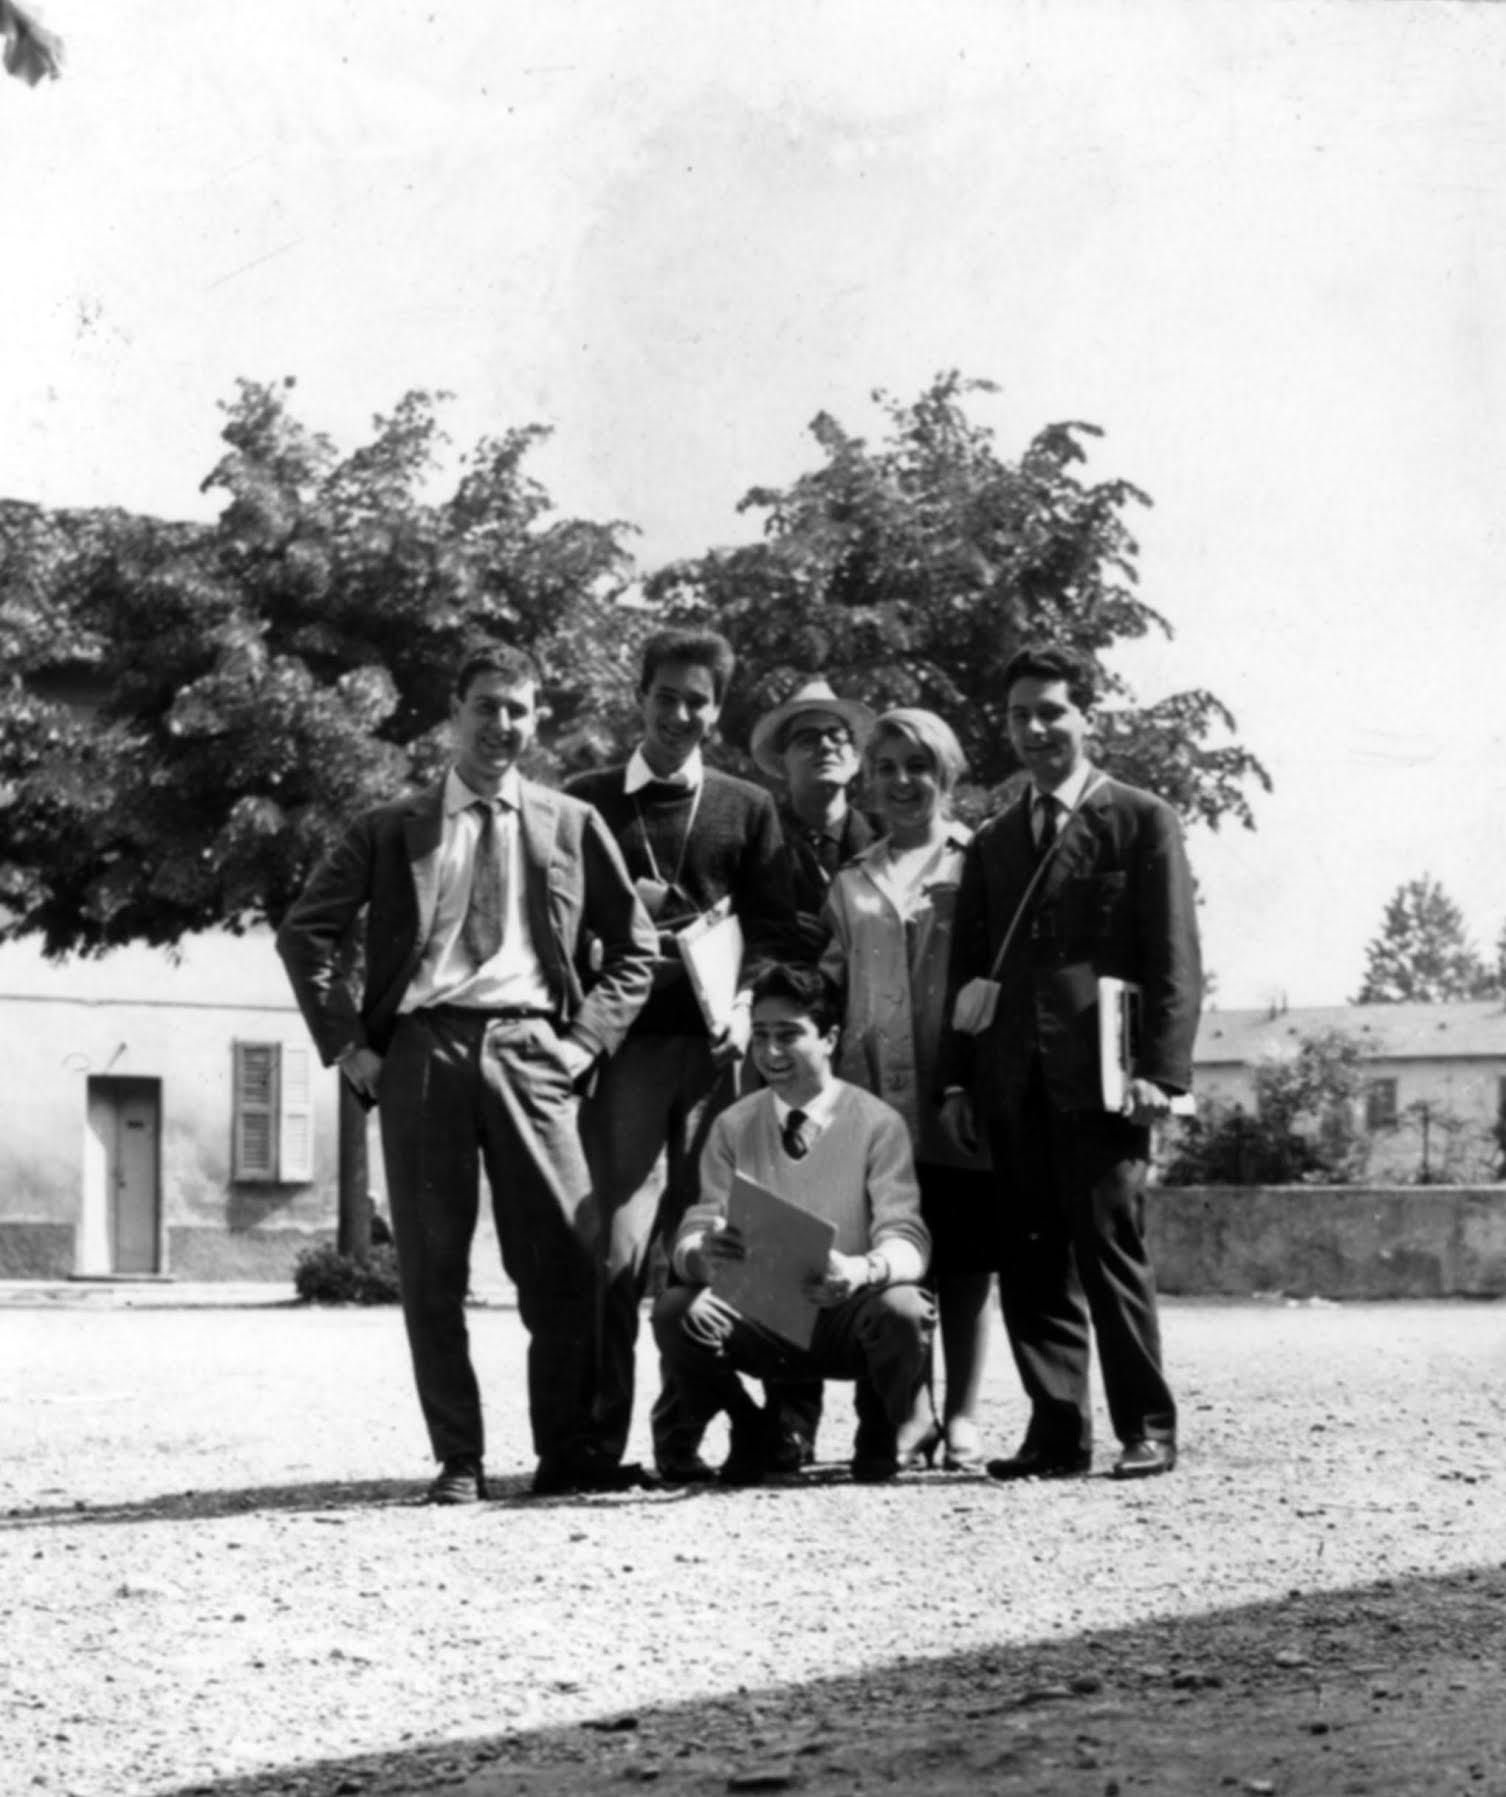 Da sinistra: Alberto Seassaro, Renzo Piano, Ugo La Pietra, Milly Cappellaro - 1961